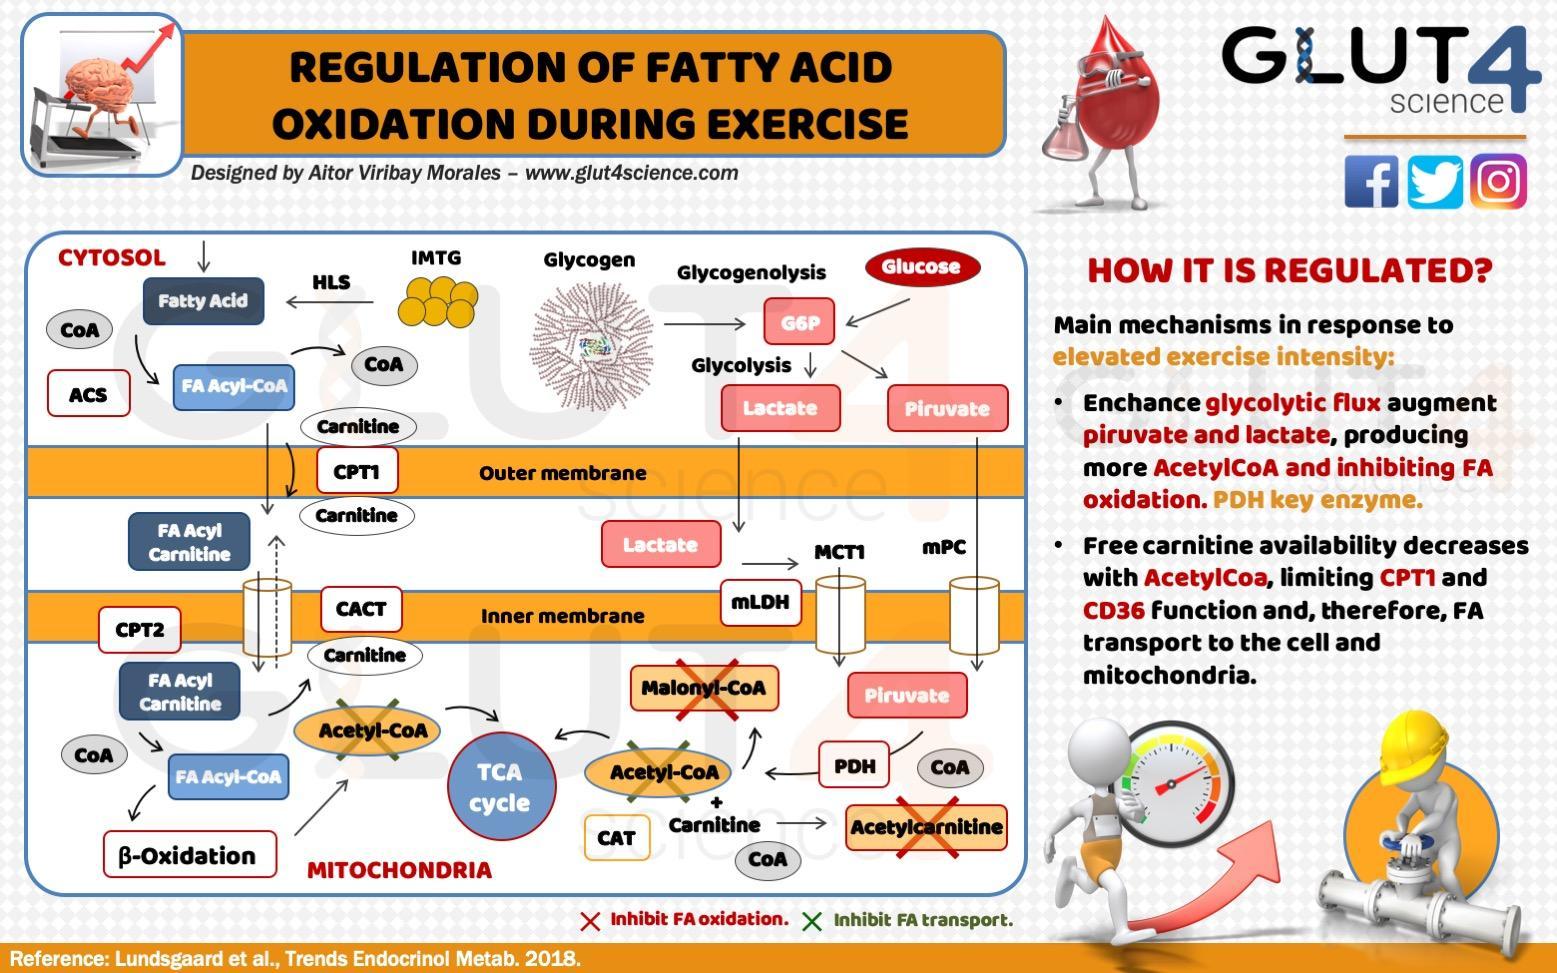 Regulation of Fatty Acid Oxidation During Exercise